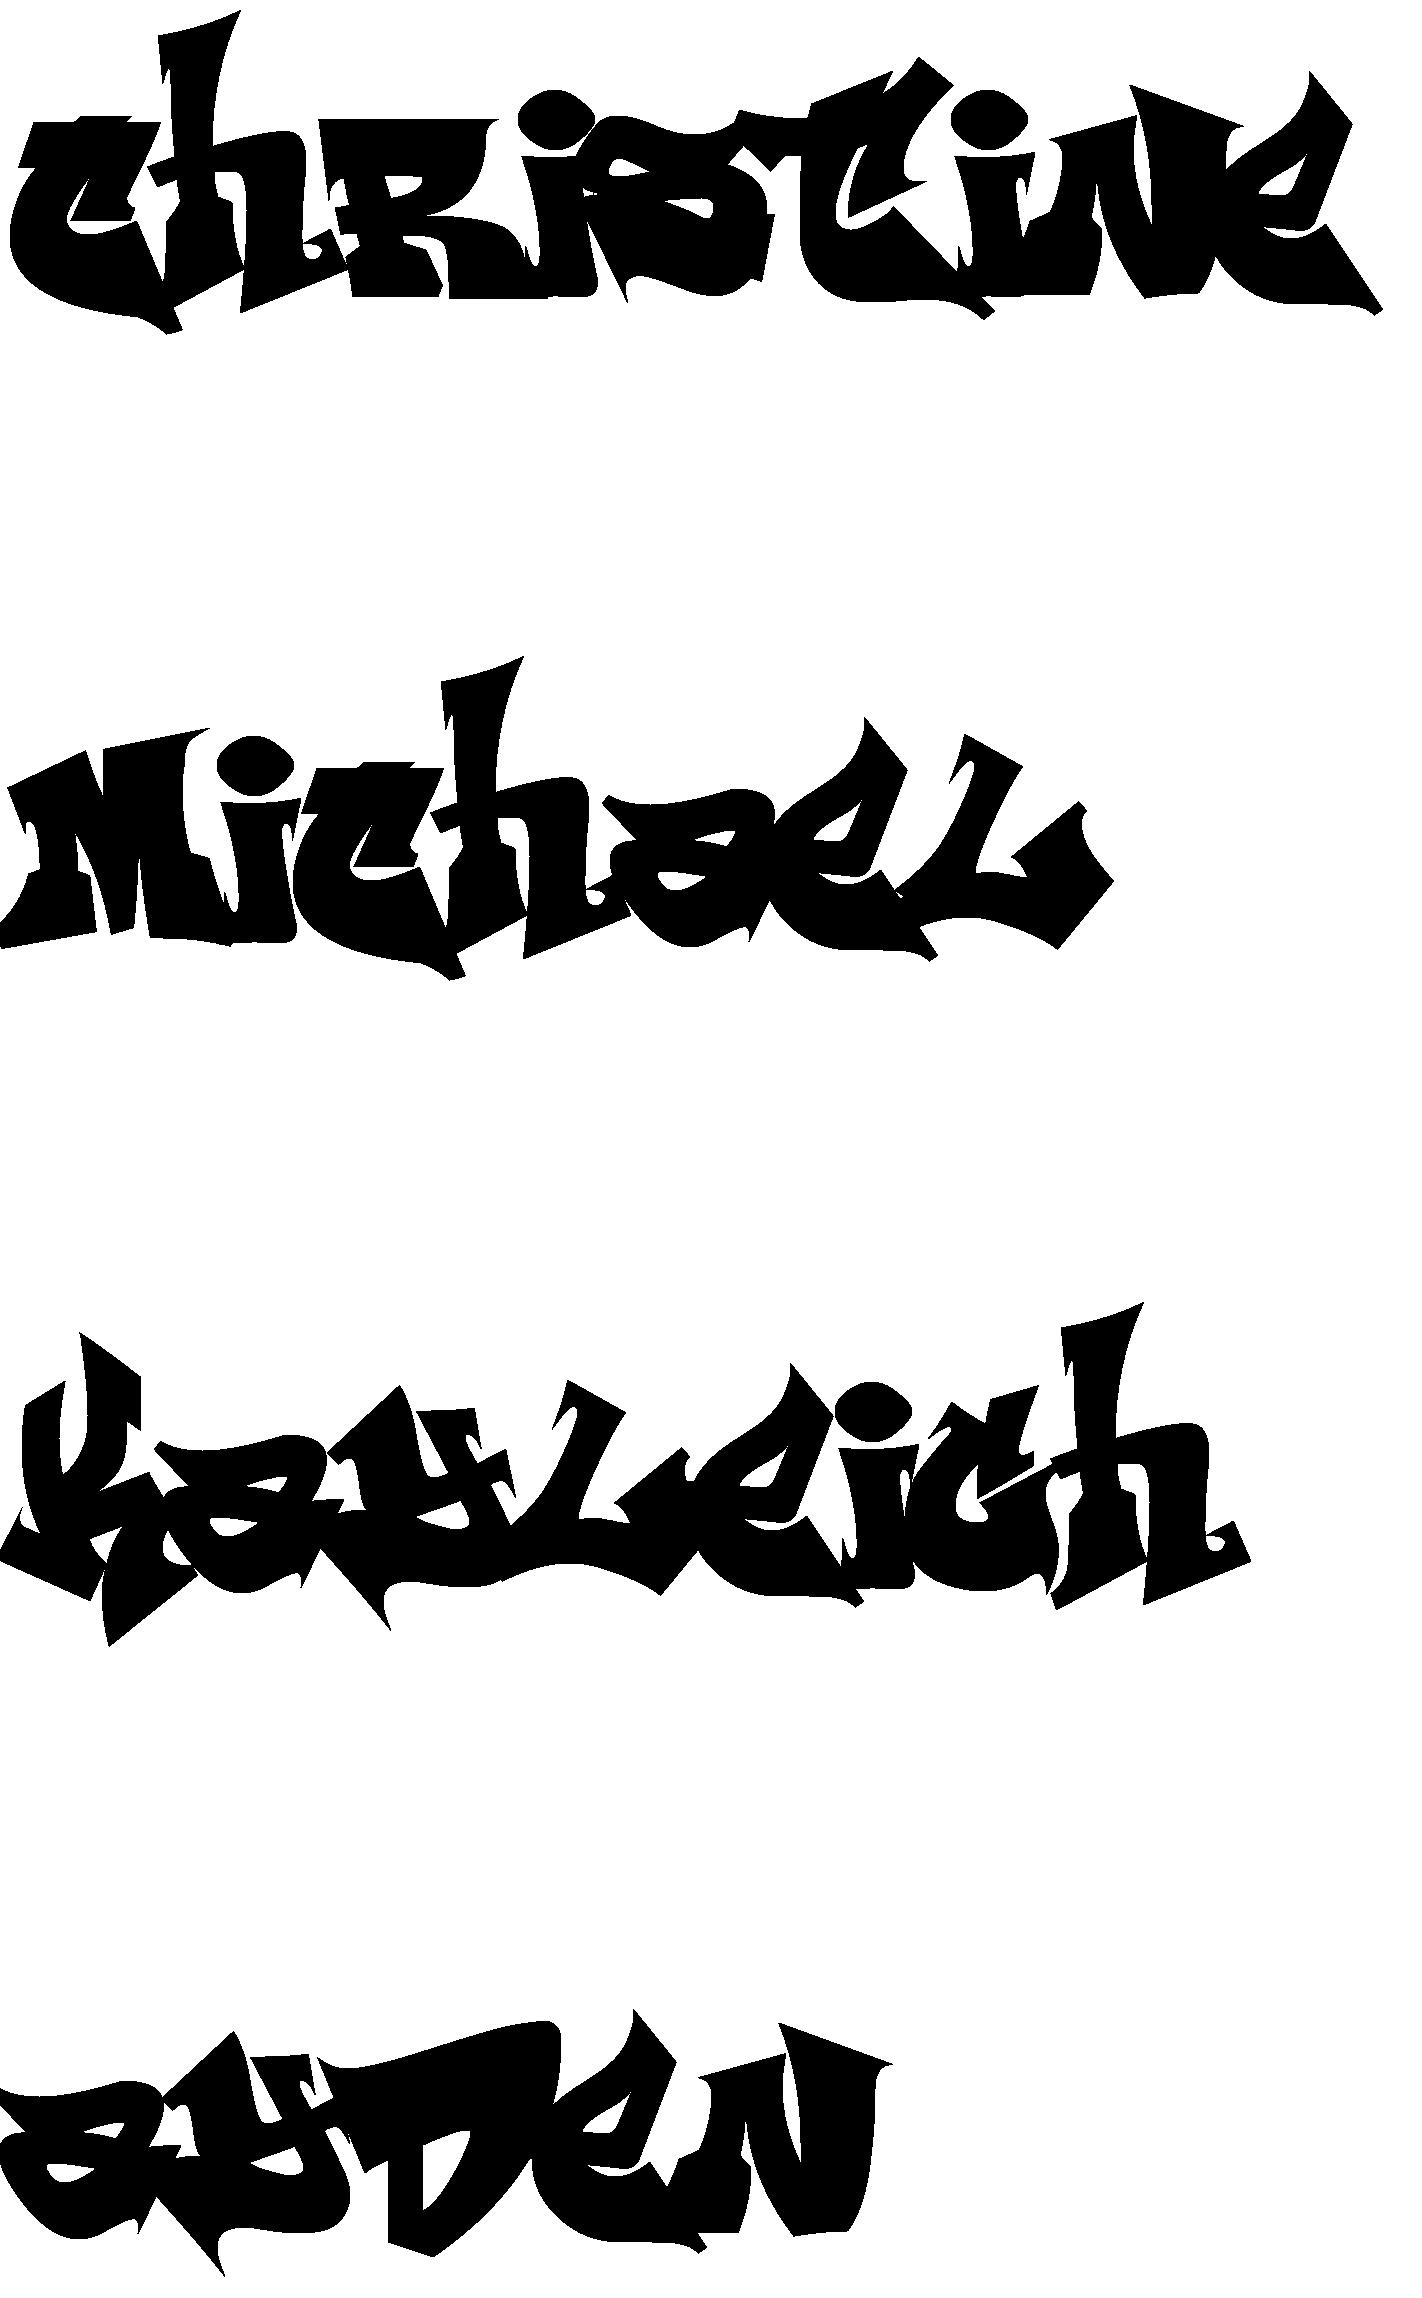 Fonts creator silhouette online. Graffiti clipart word